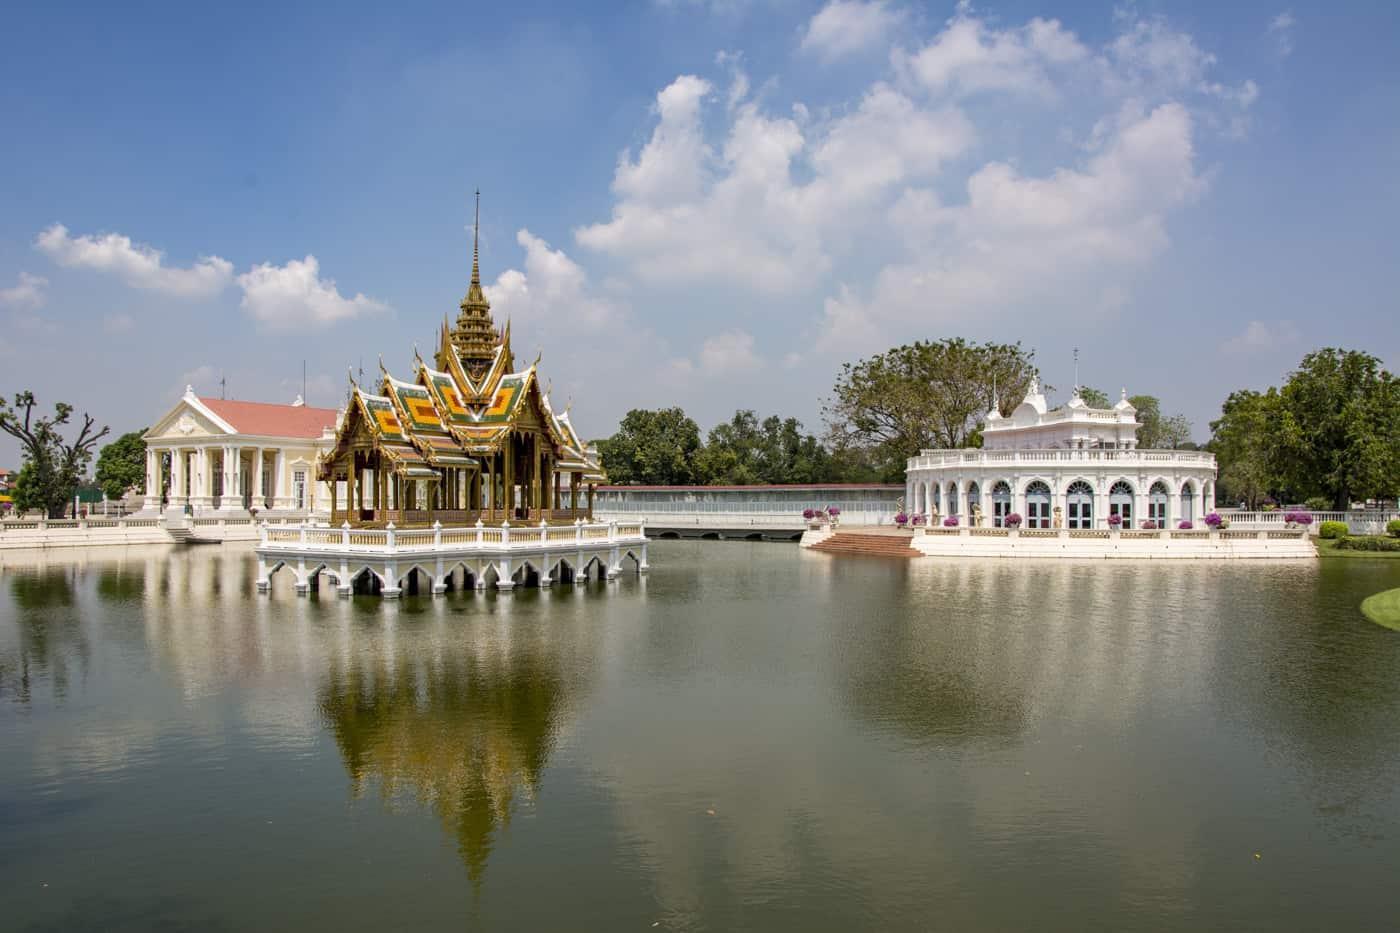 Prah Thinang Aisawan und das Tevaraj-Kanlai Tor im Großen Teich